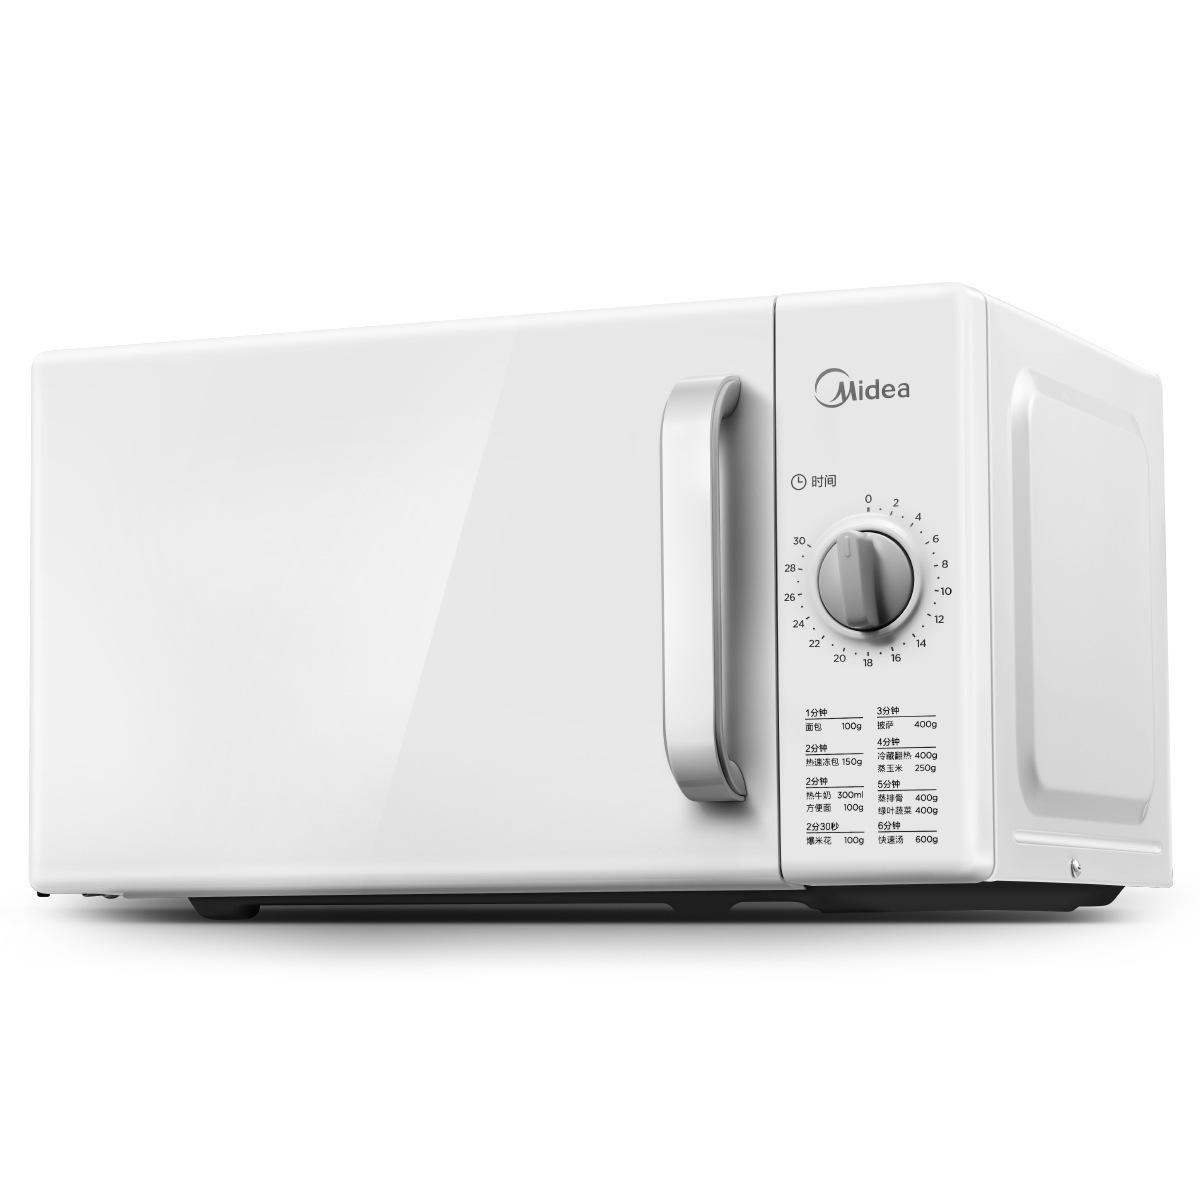 Midea Lò vi sóng, lò nướng / Midea M1-201A microwave mini turntable multi-function household genuine